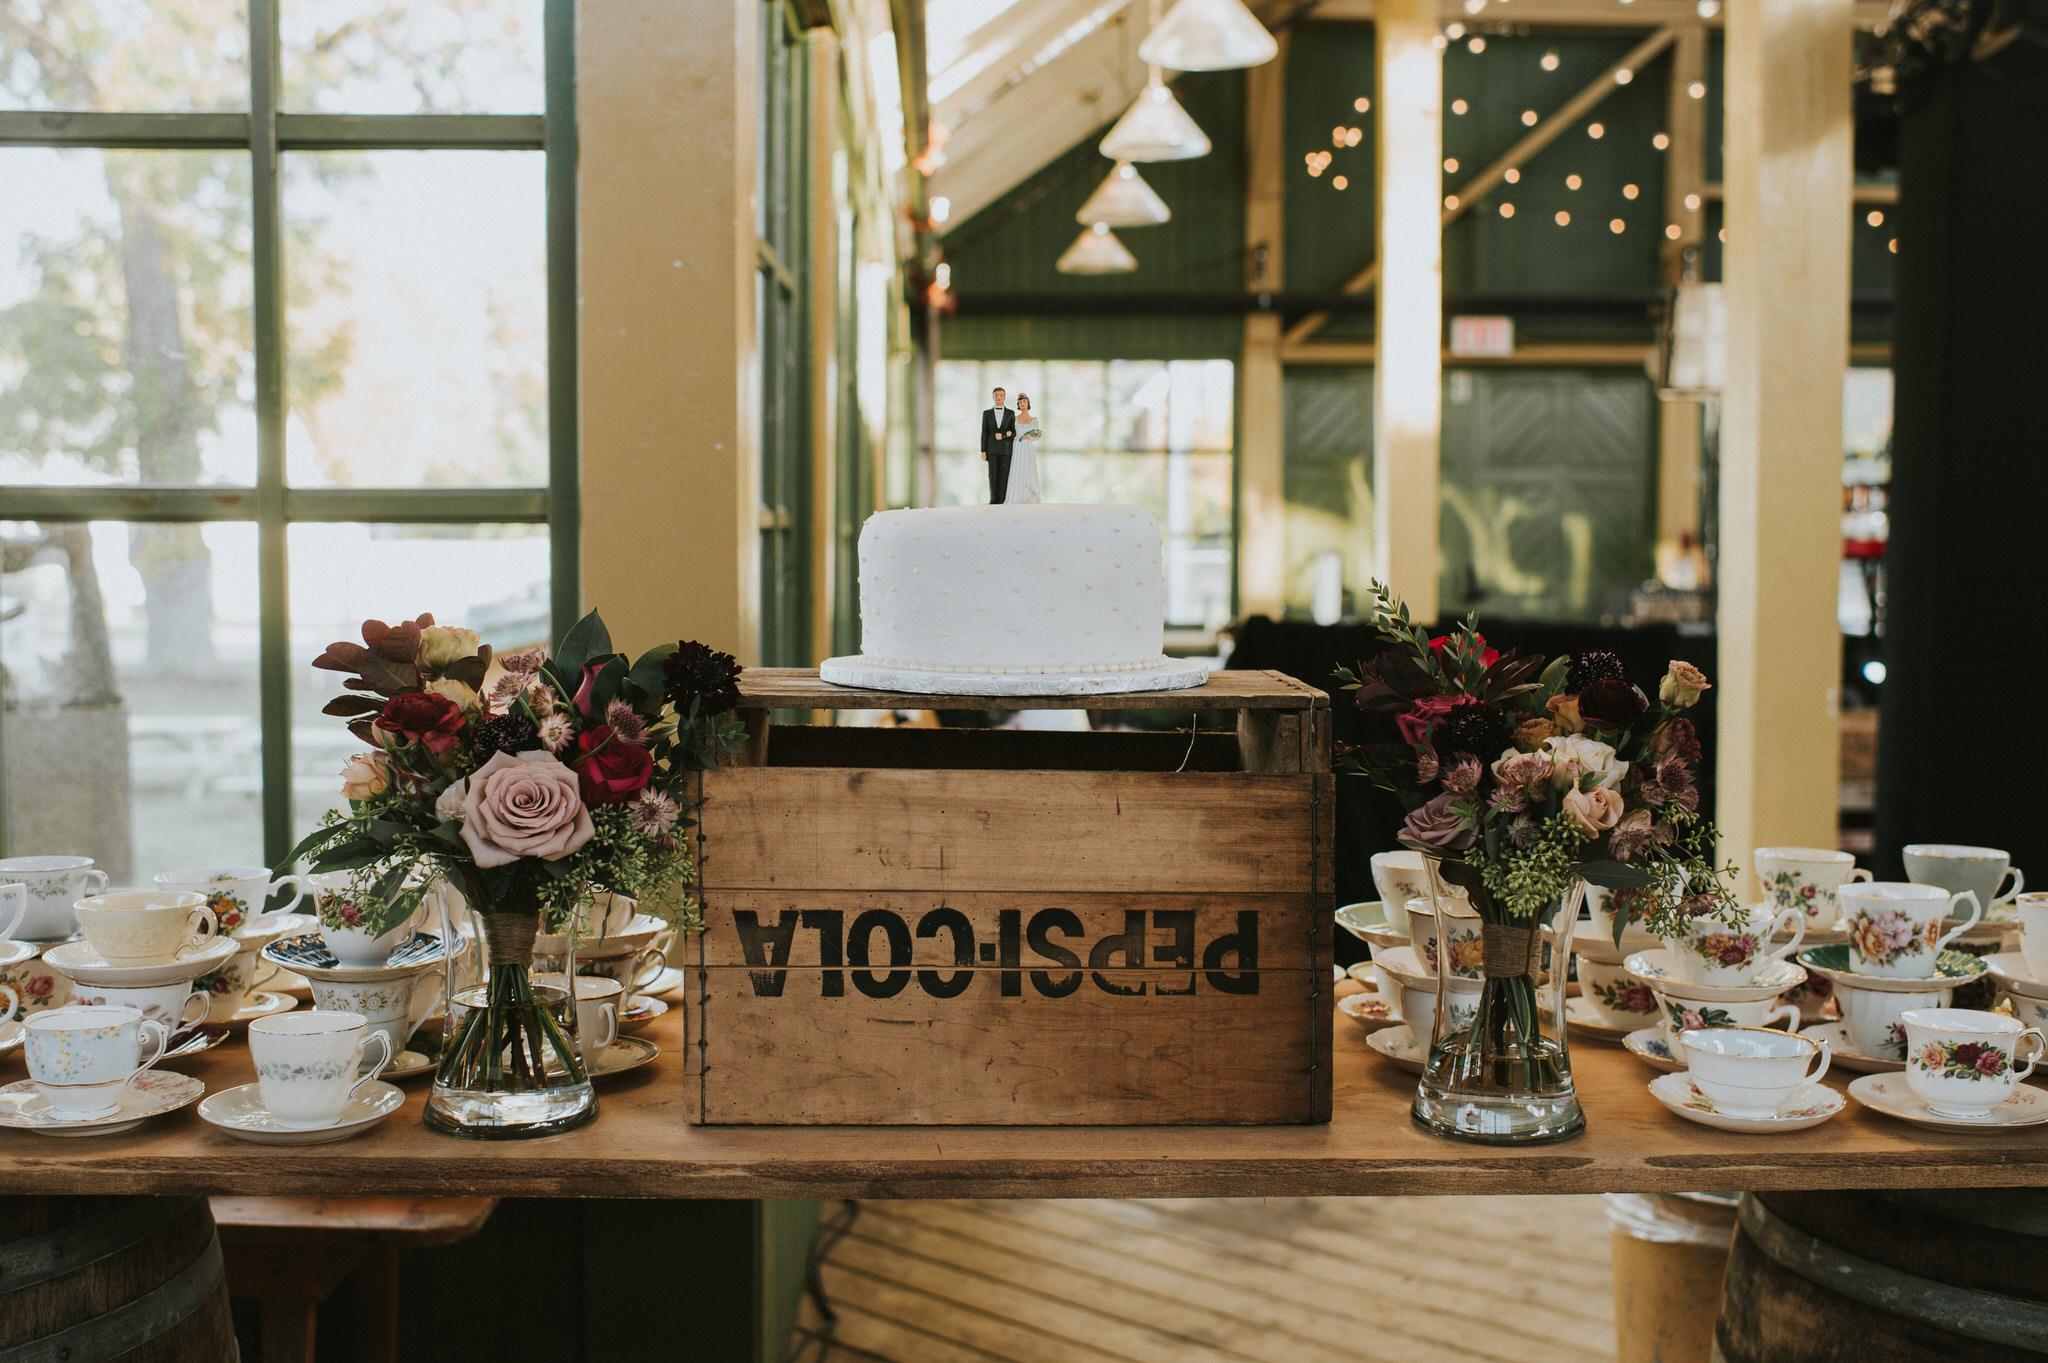 scarletoneillphotography_weddingphotography_prince edward county weddings140.JPG